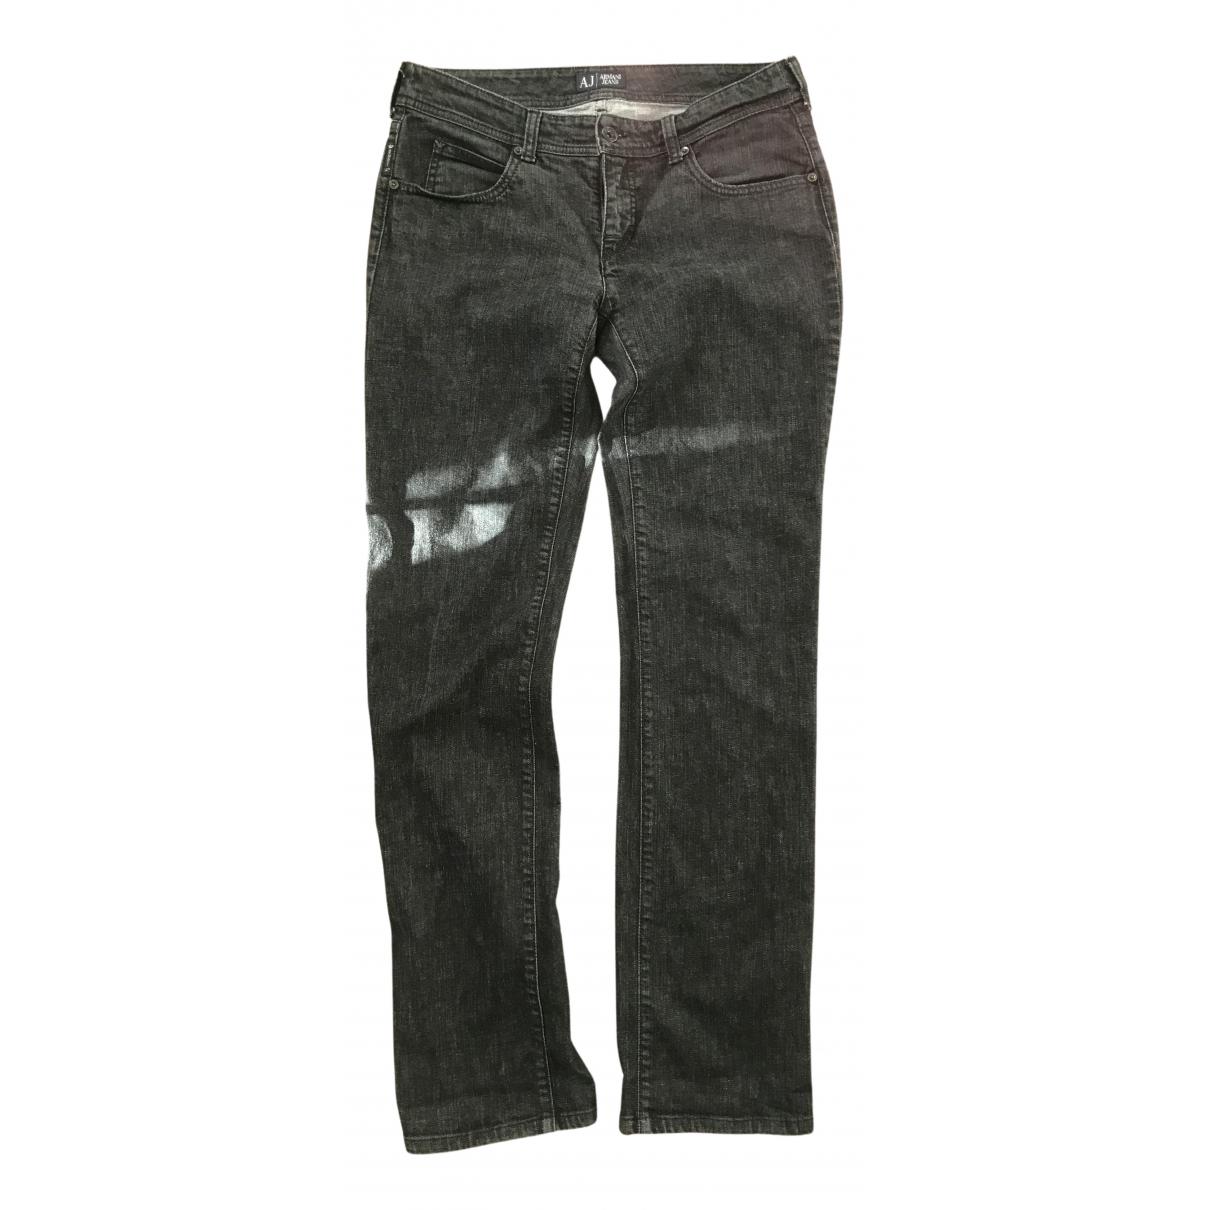 Armani Jeans N Black Cotton - elasthane Jeans for Women 30 US